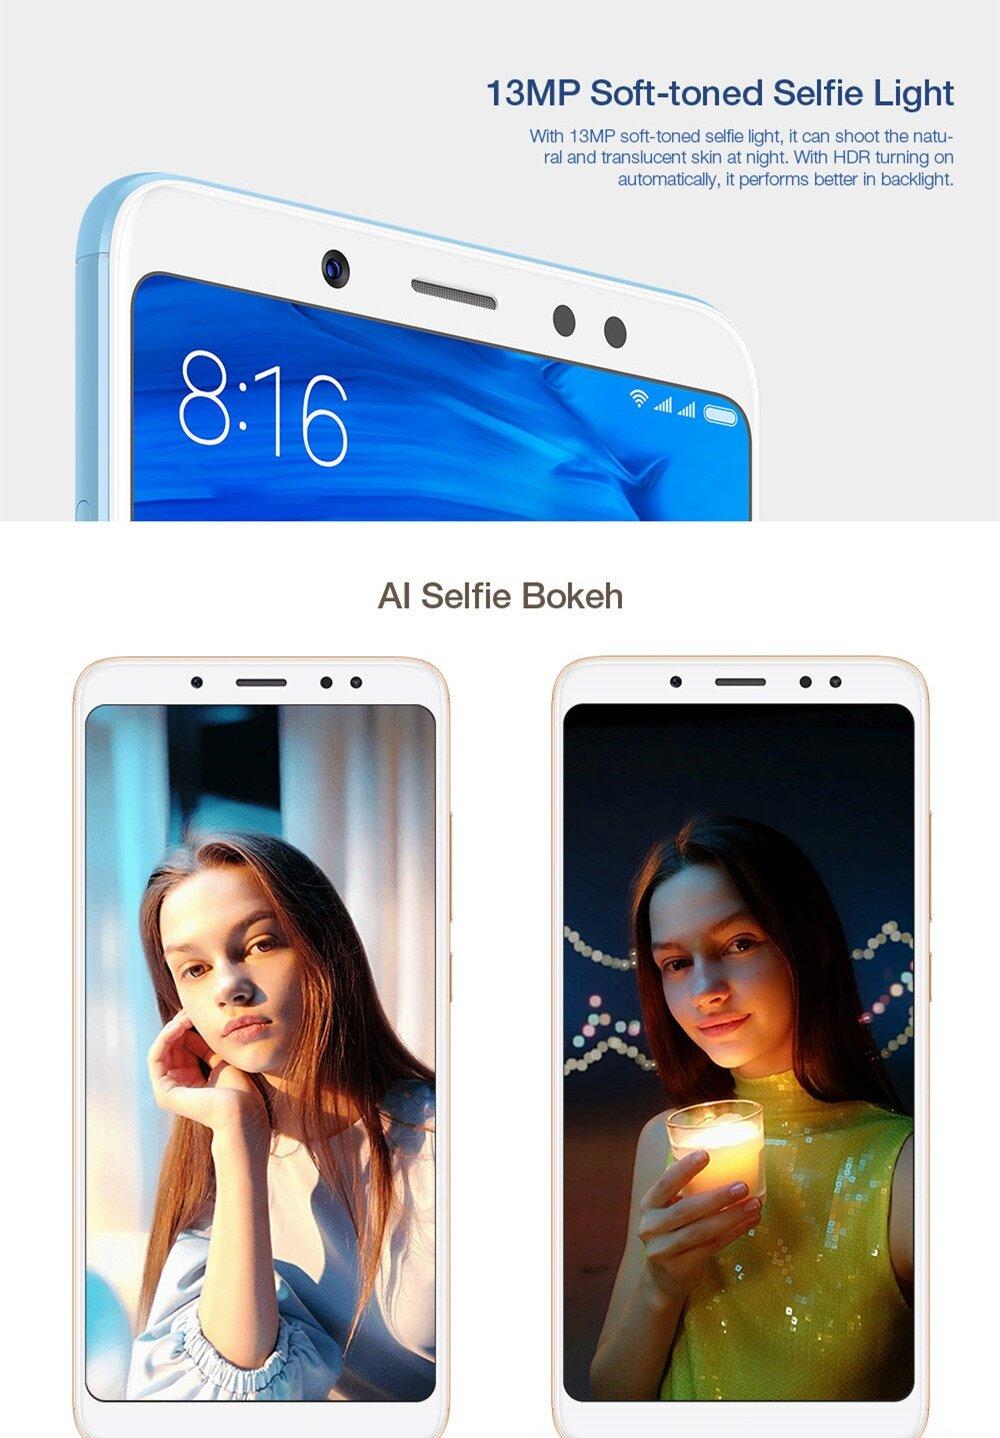 Xiaomi Redmi Note 5 5.99 Inch Smartphone Snapdragon 636 Octa Core 4GB 64GB 5.0MP+12MP Dual Rear Cameras MIUI 9 OS 18:9 Full Screen - Gold